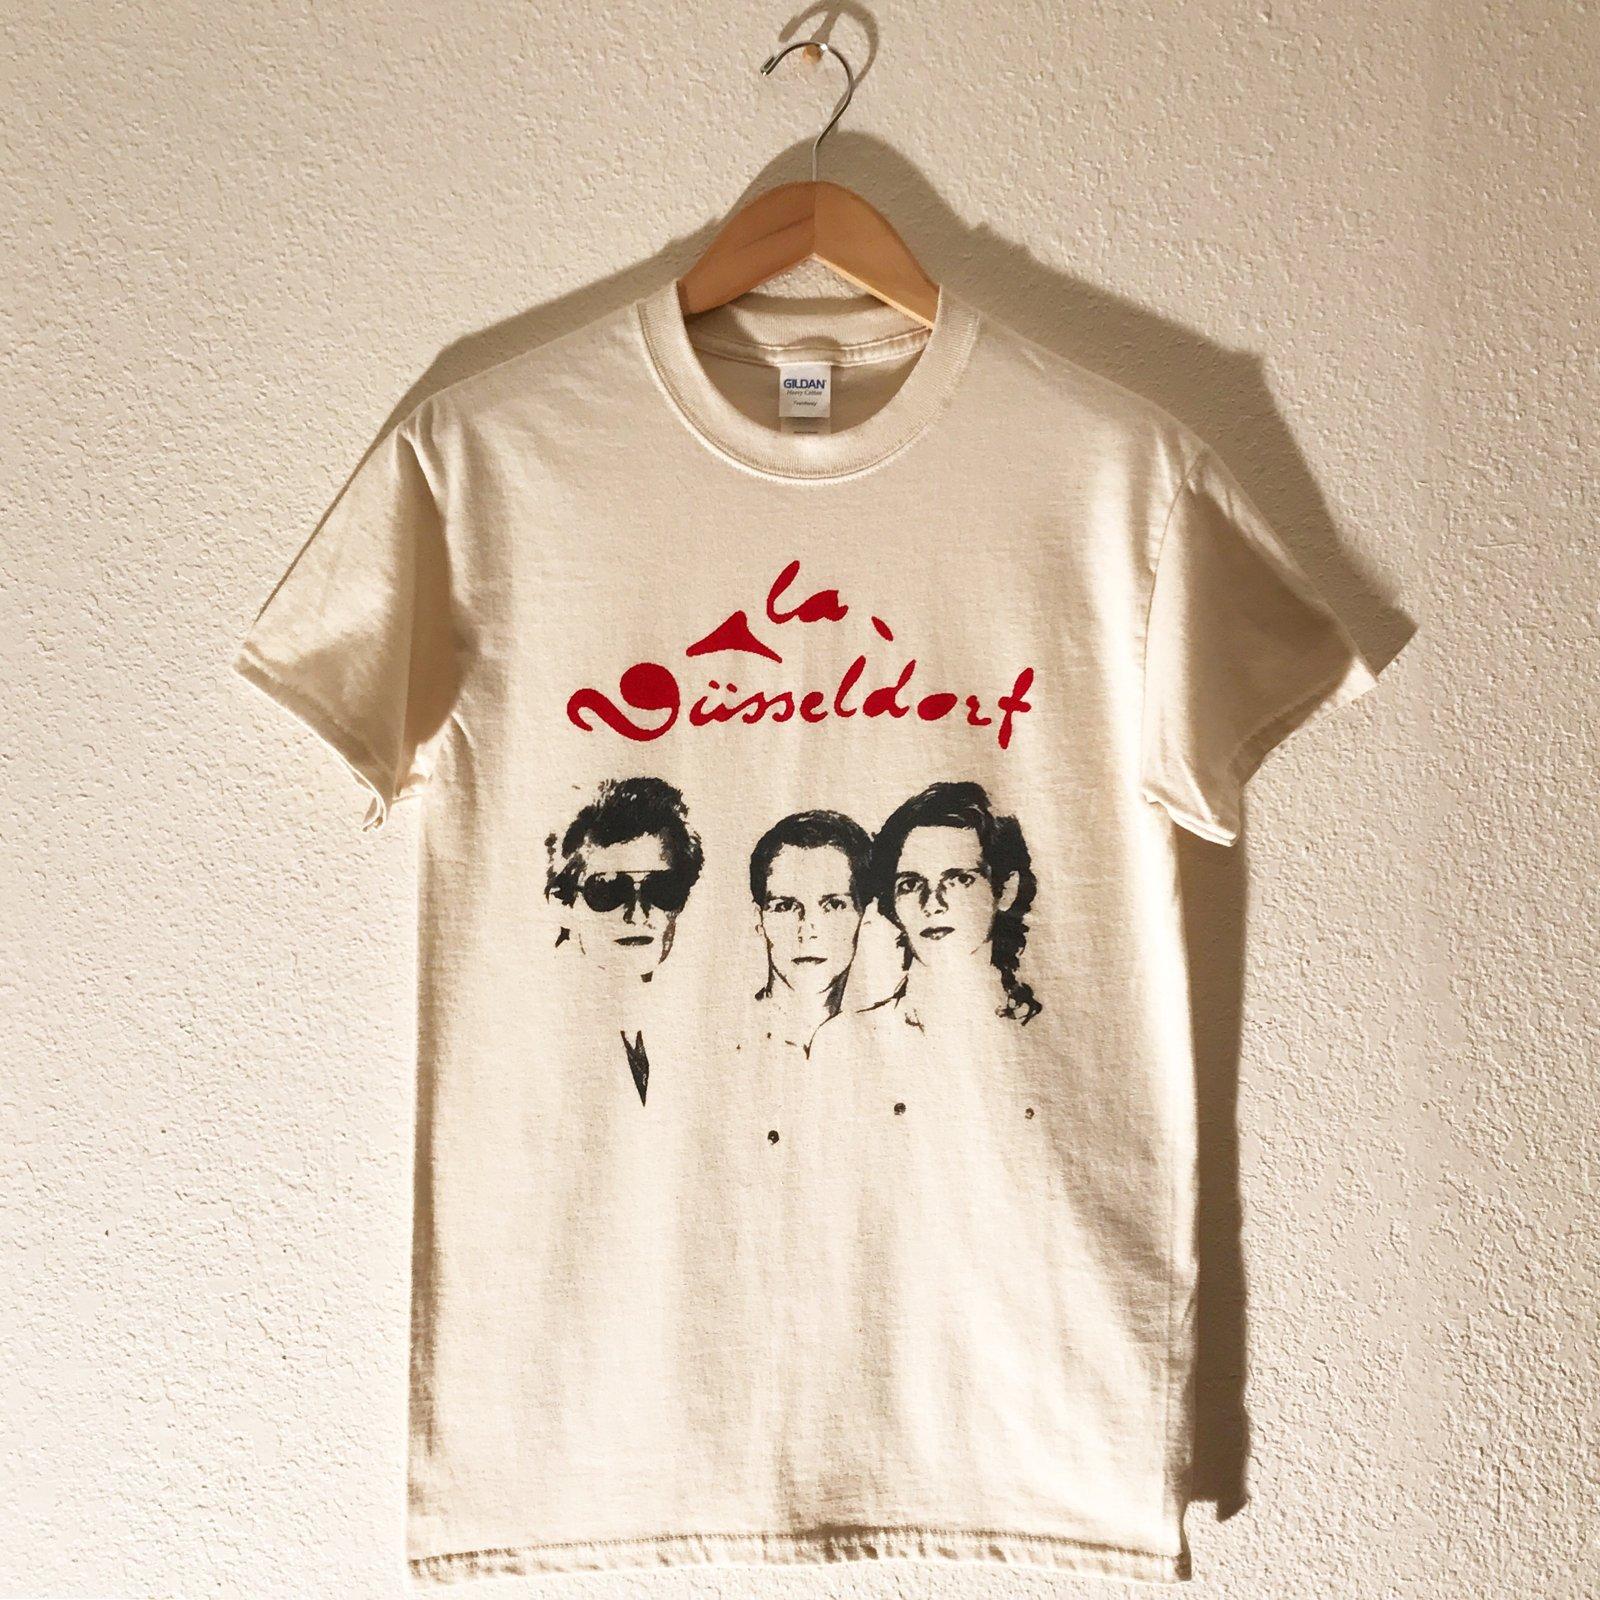 Düsseldorf 1904 T-Shirt